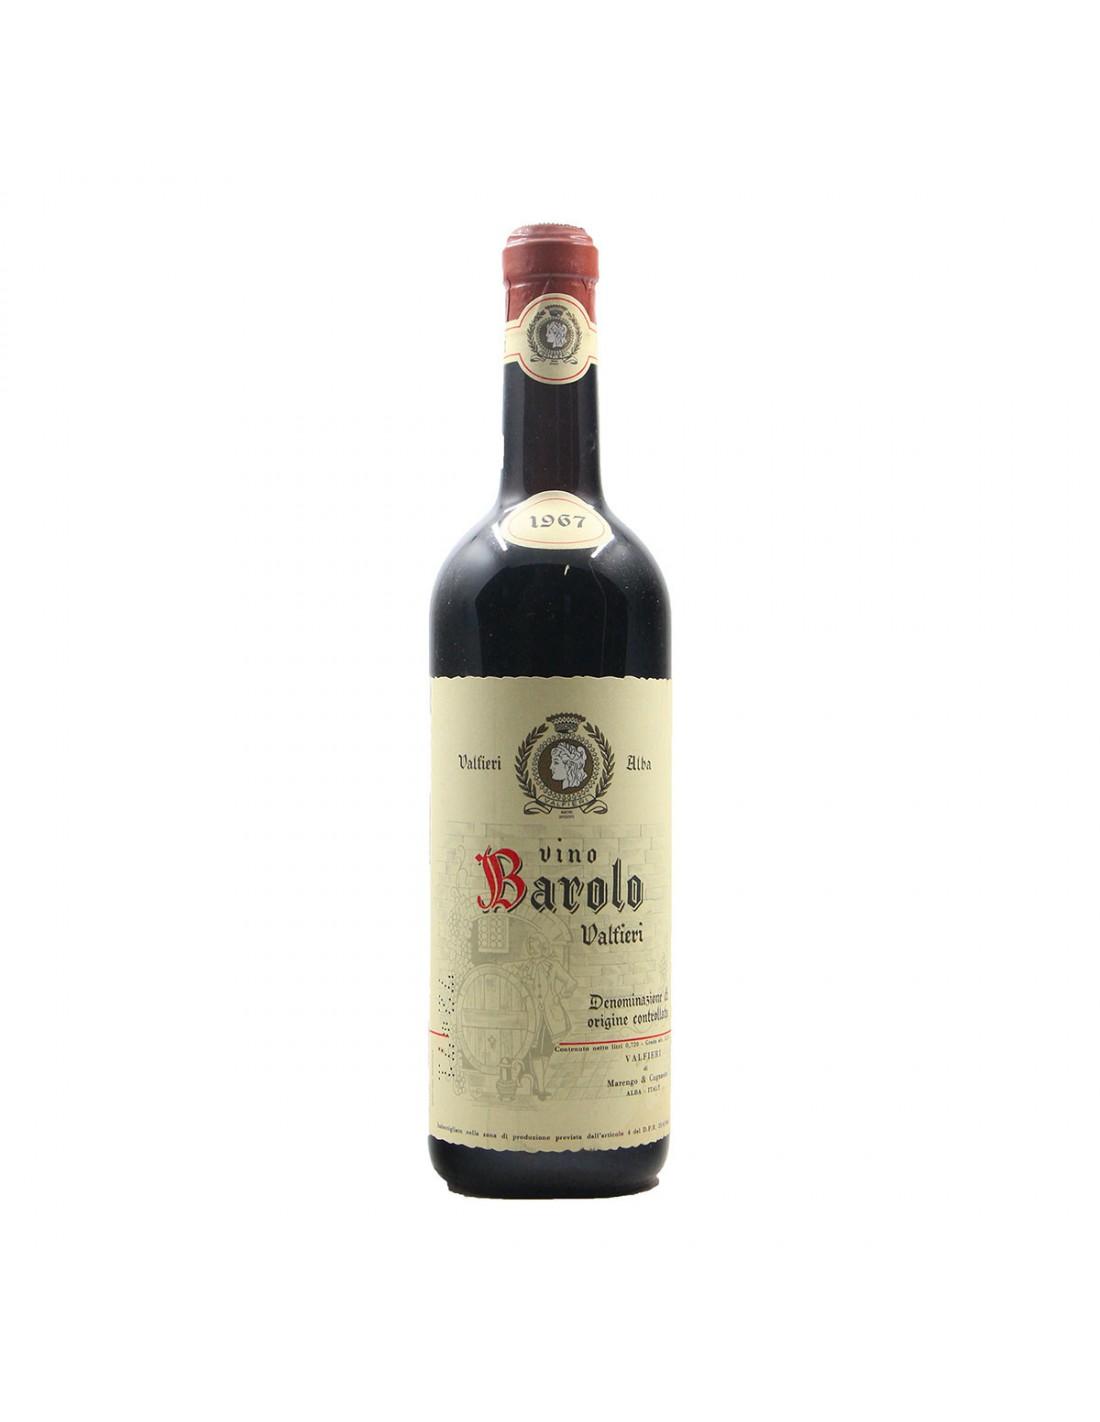 Barolo 1967 VALFIERI GRANDI BOTTIGLIE